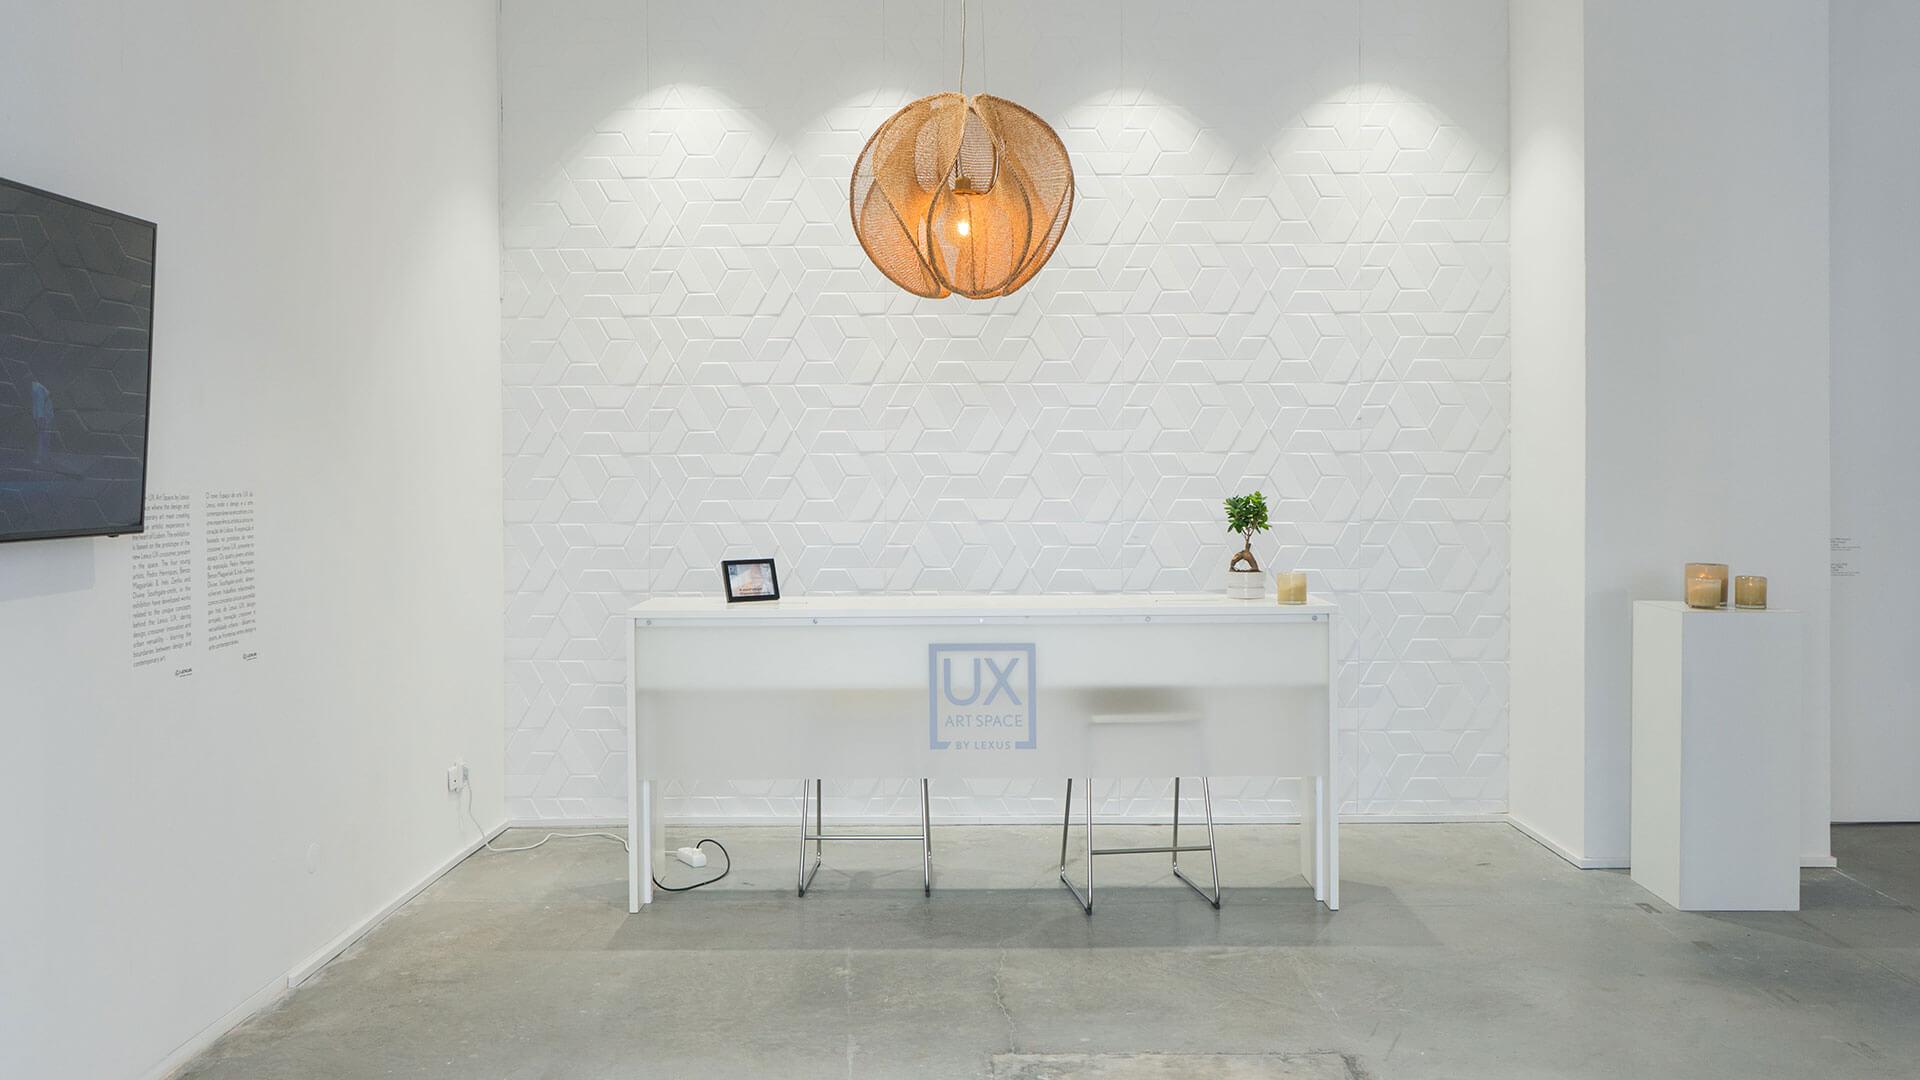 2018 lexus ux lisbon gallery 041